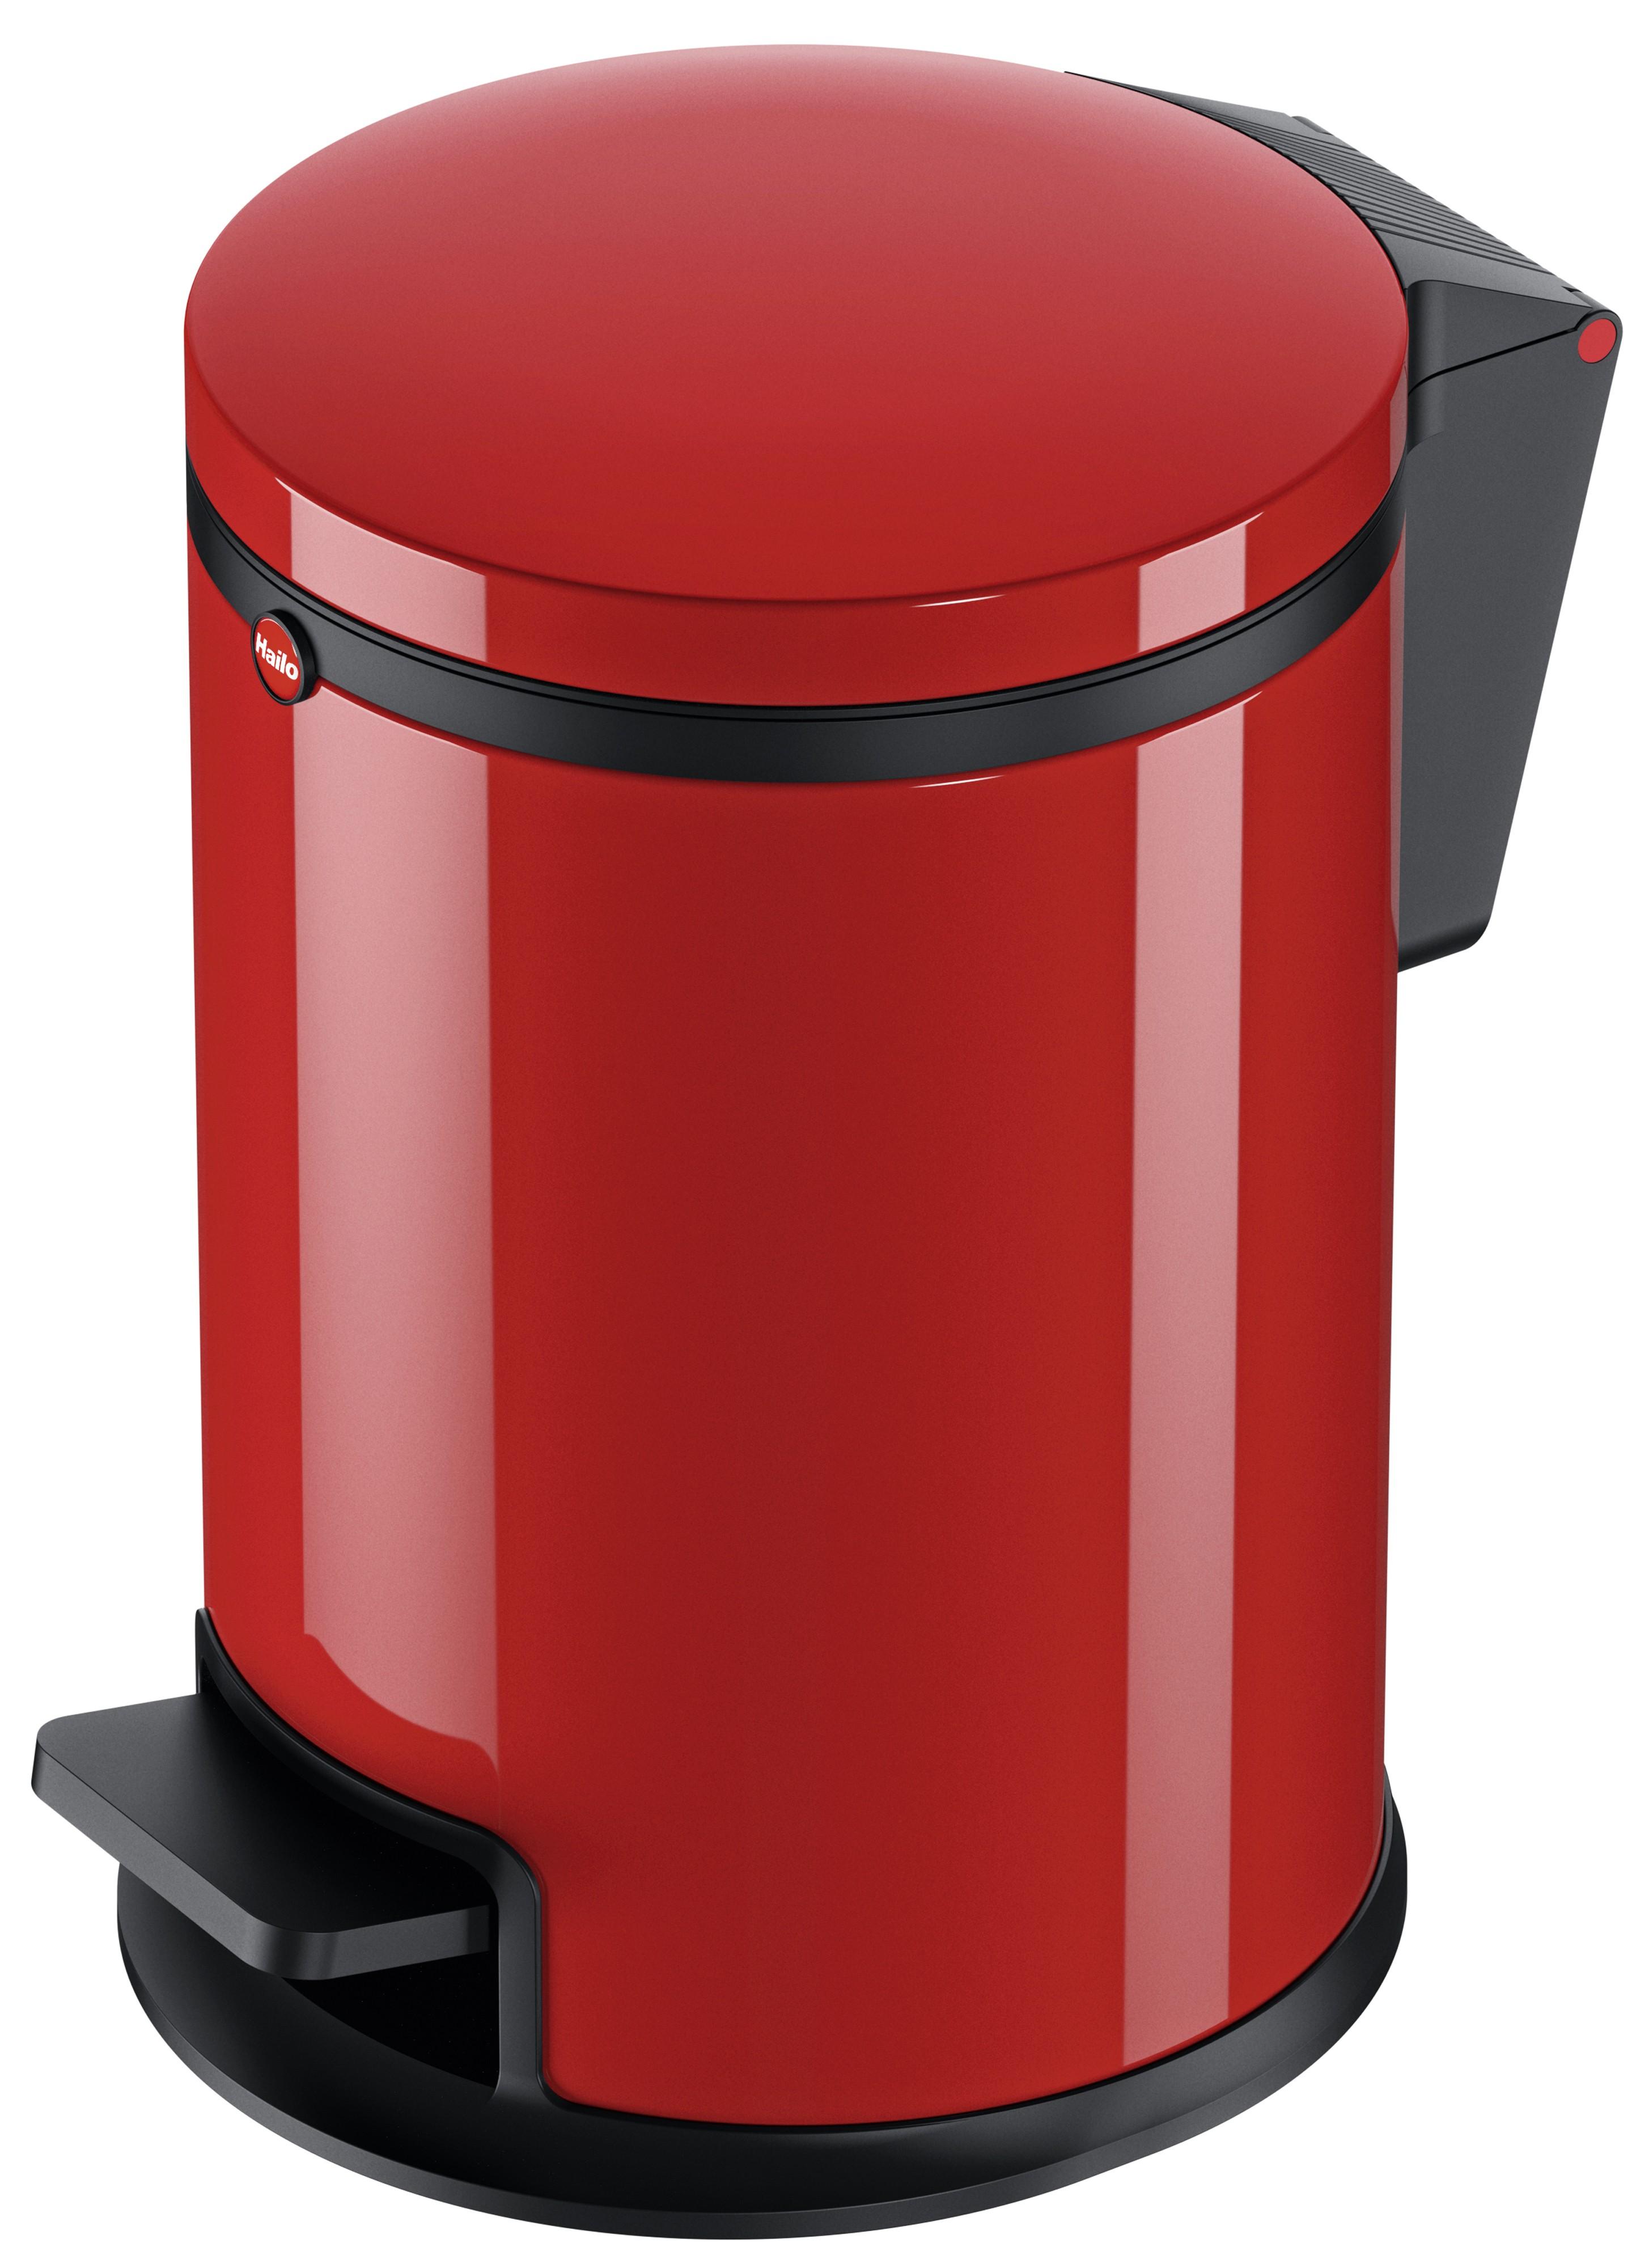 Hailo Pure S, rot, 3 Liter, Inneneimer: Kunststoff, Tret-Kosmetikeimer